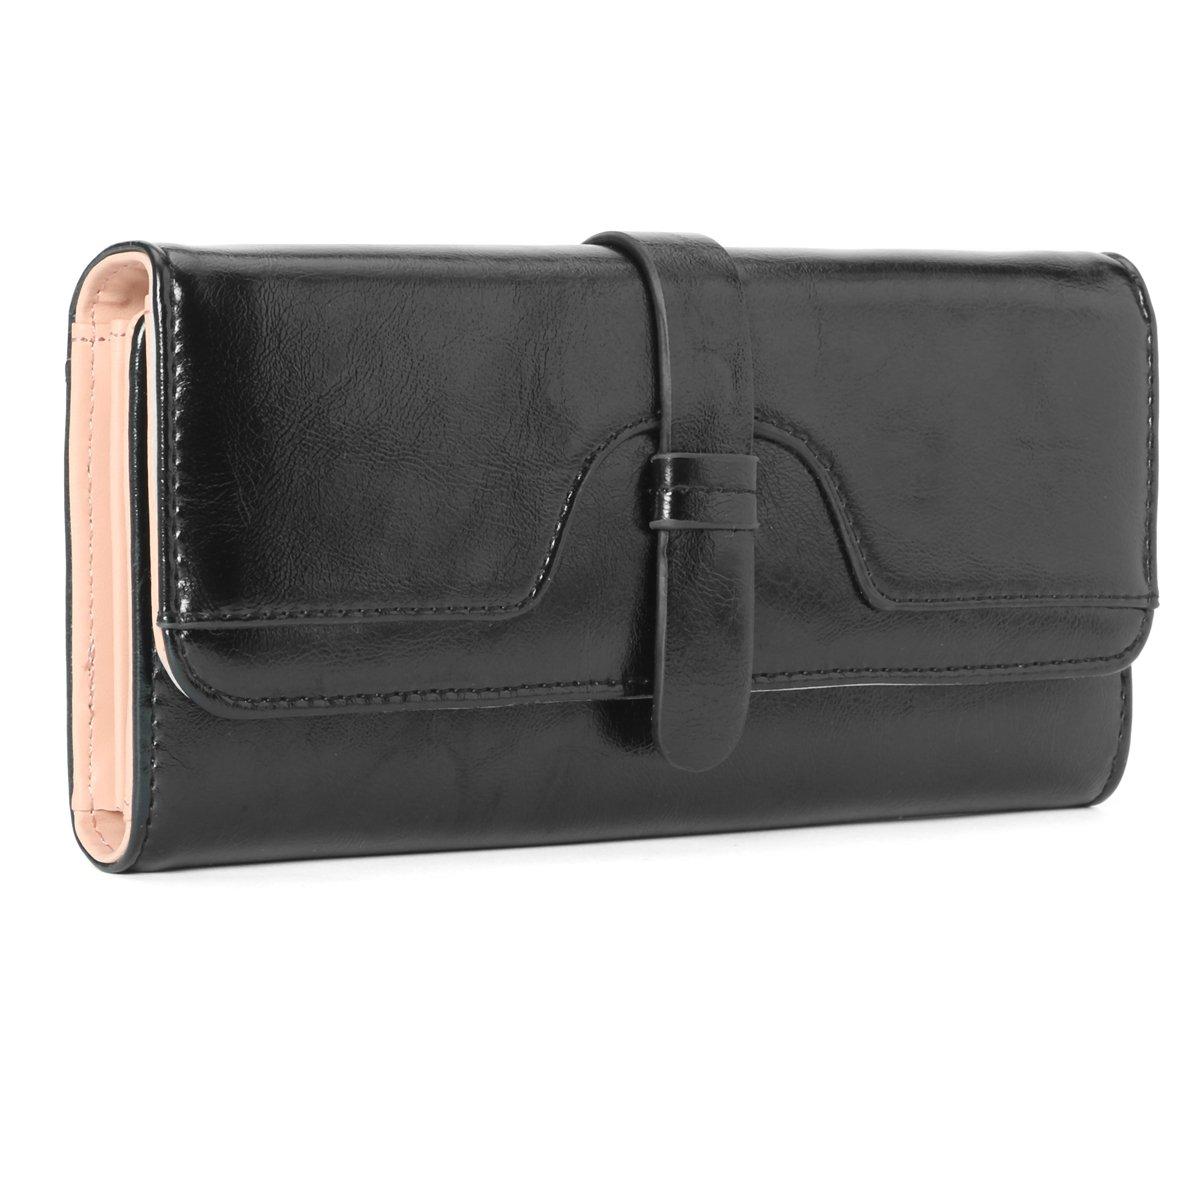 Ladies Purse, Tezoo Women's Blocking Large Capacity Luxury Wax PU Leather Clutch Wallet Card Holder Organizer Black